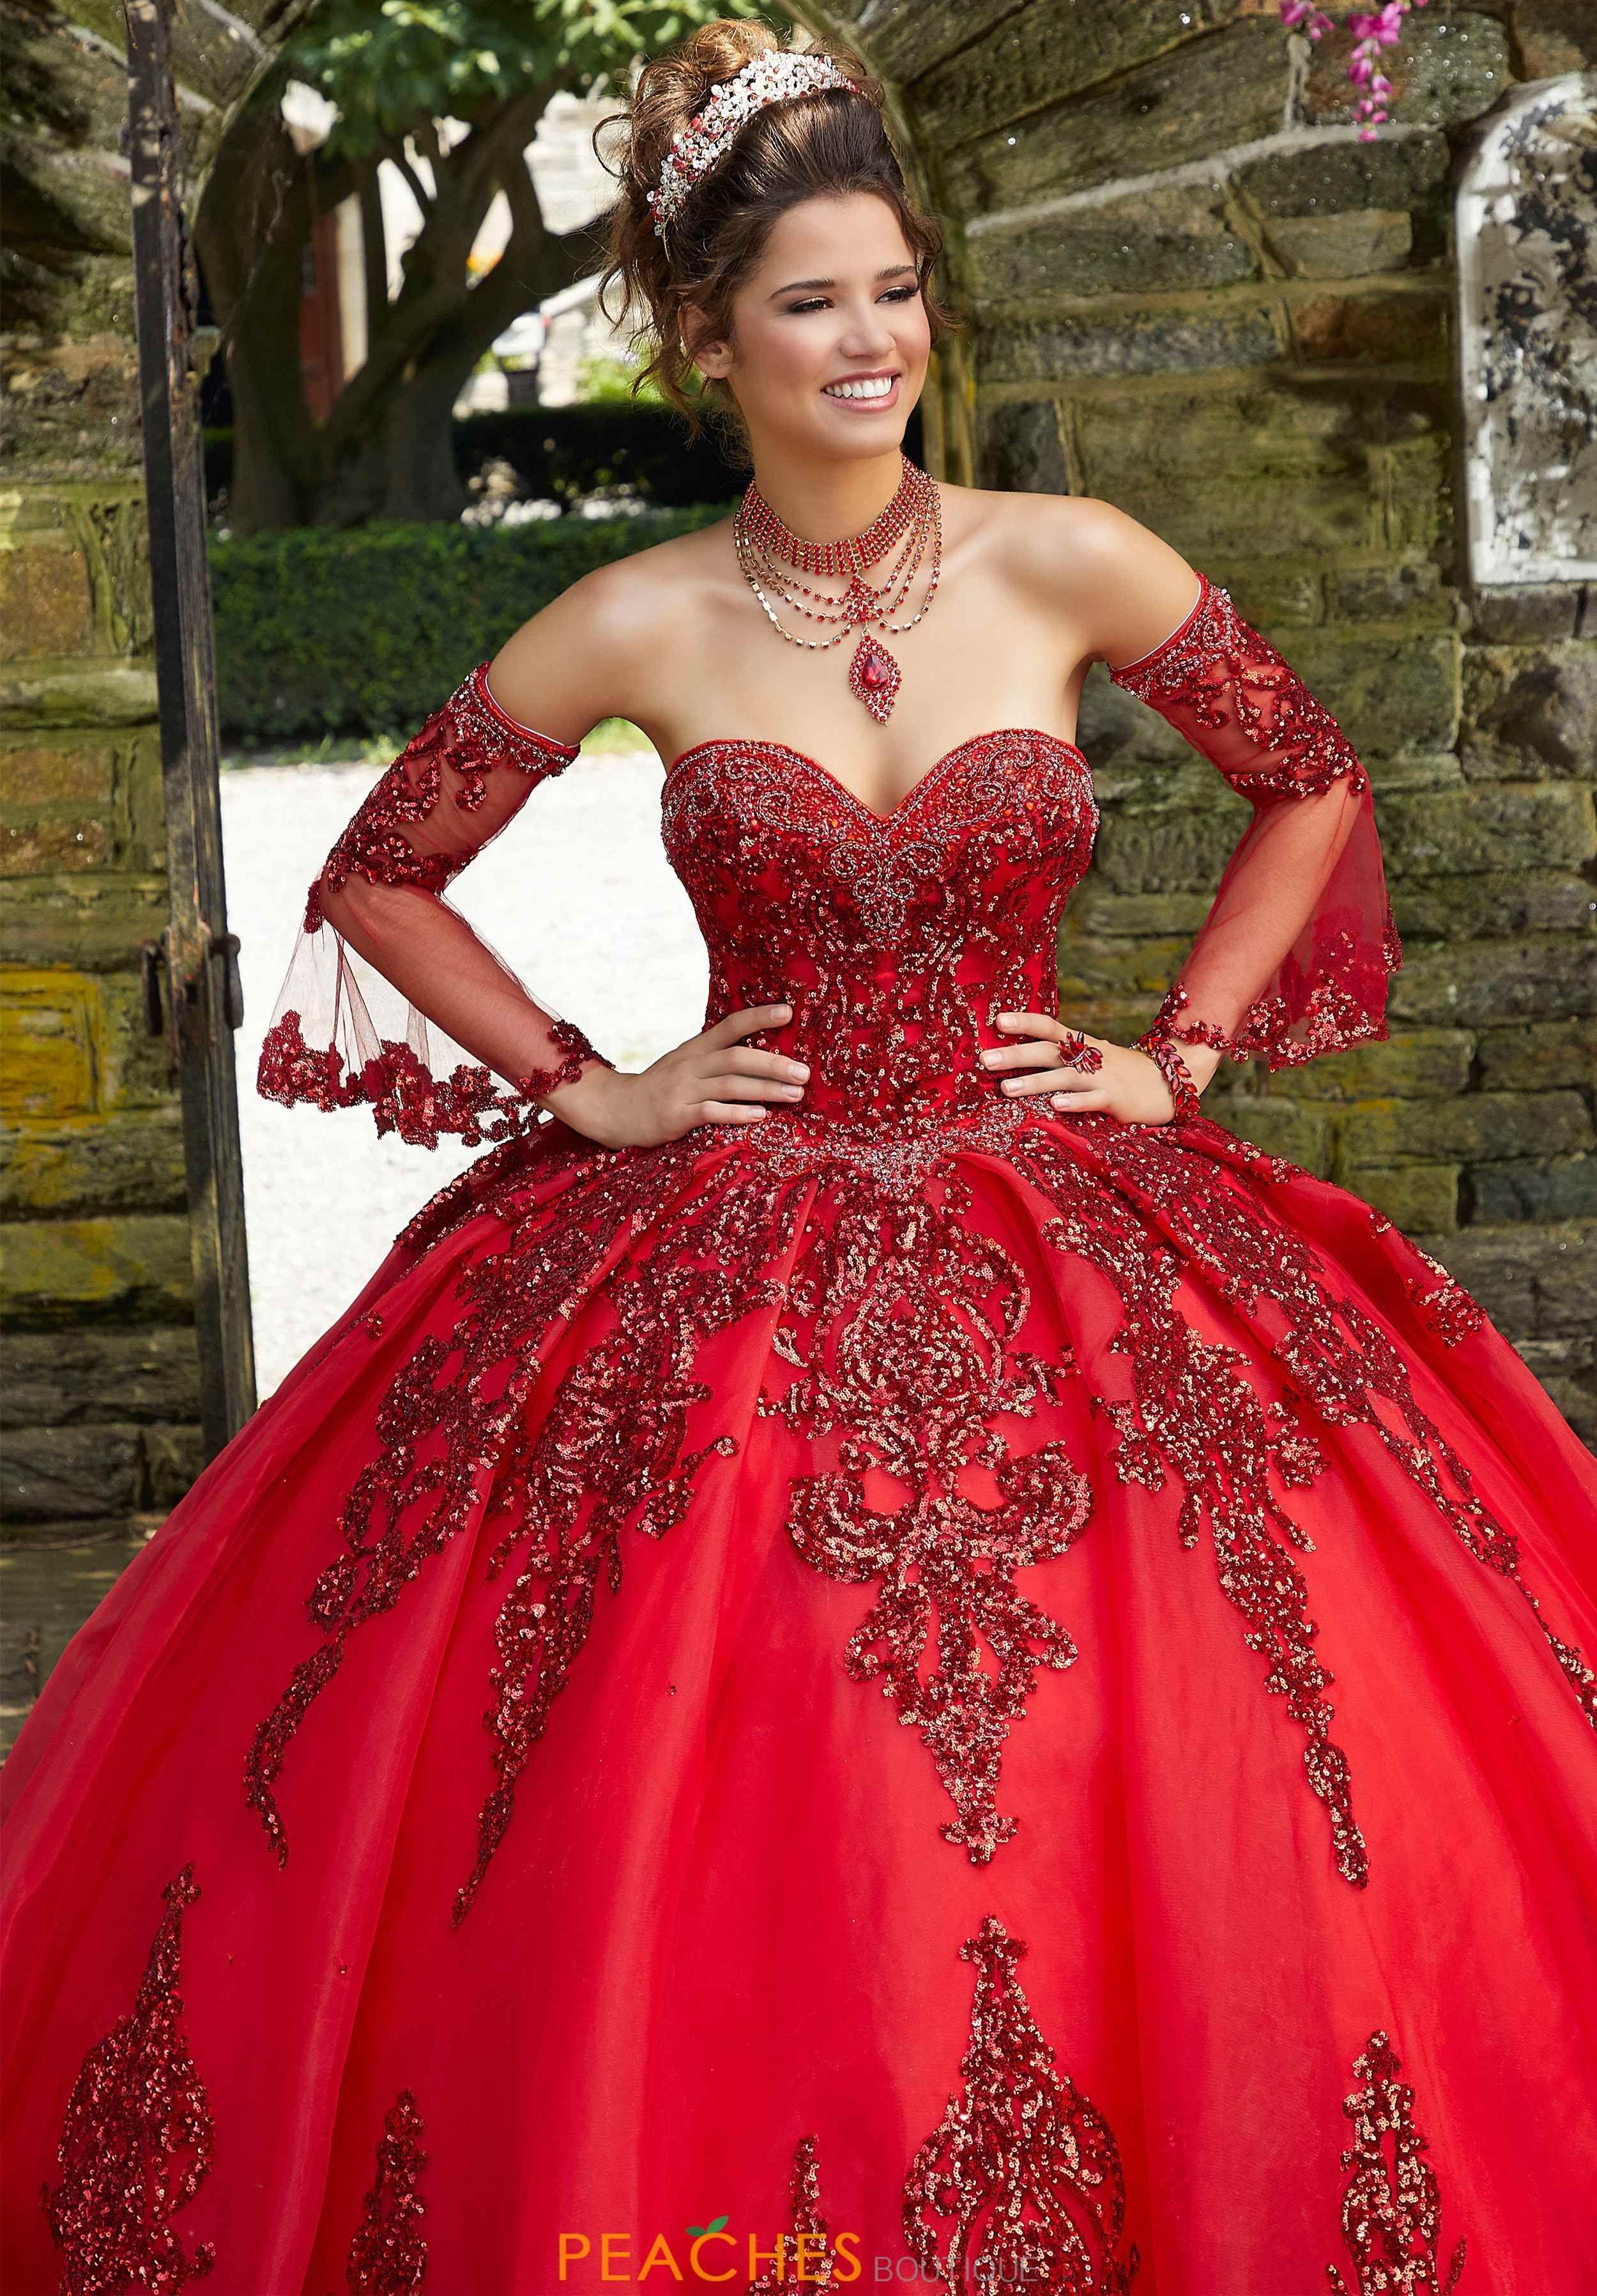 Vizcaya Dress 89255 Peachesboutique Com Quinceanera Dresses Gold Red Quinceanera Dresses Quinceanera Dresses [ 3594 x 2500 Pixel ]